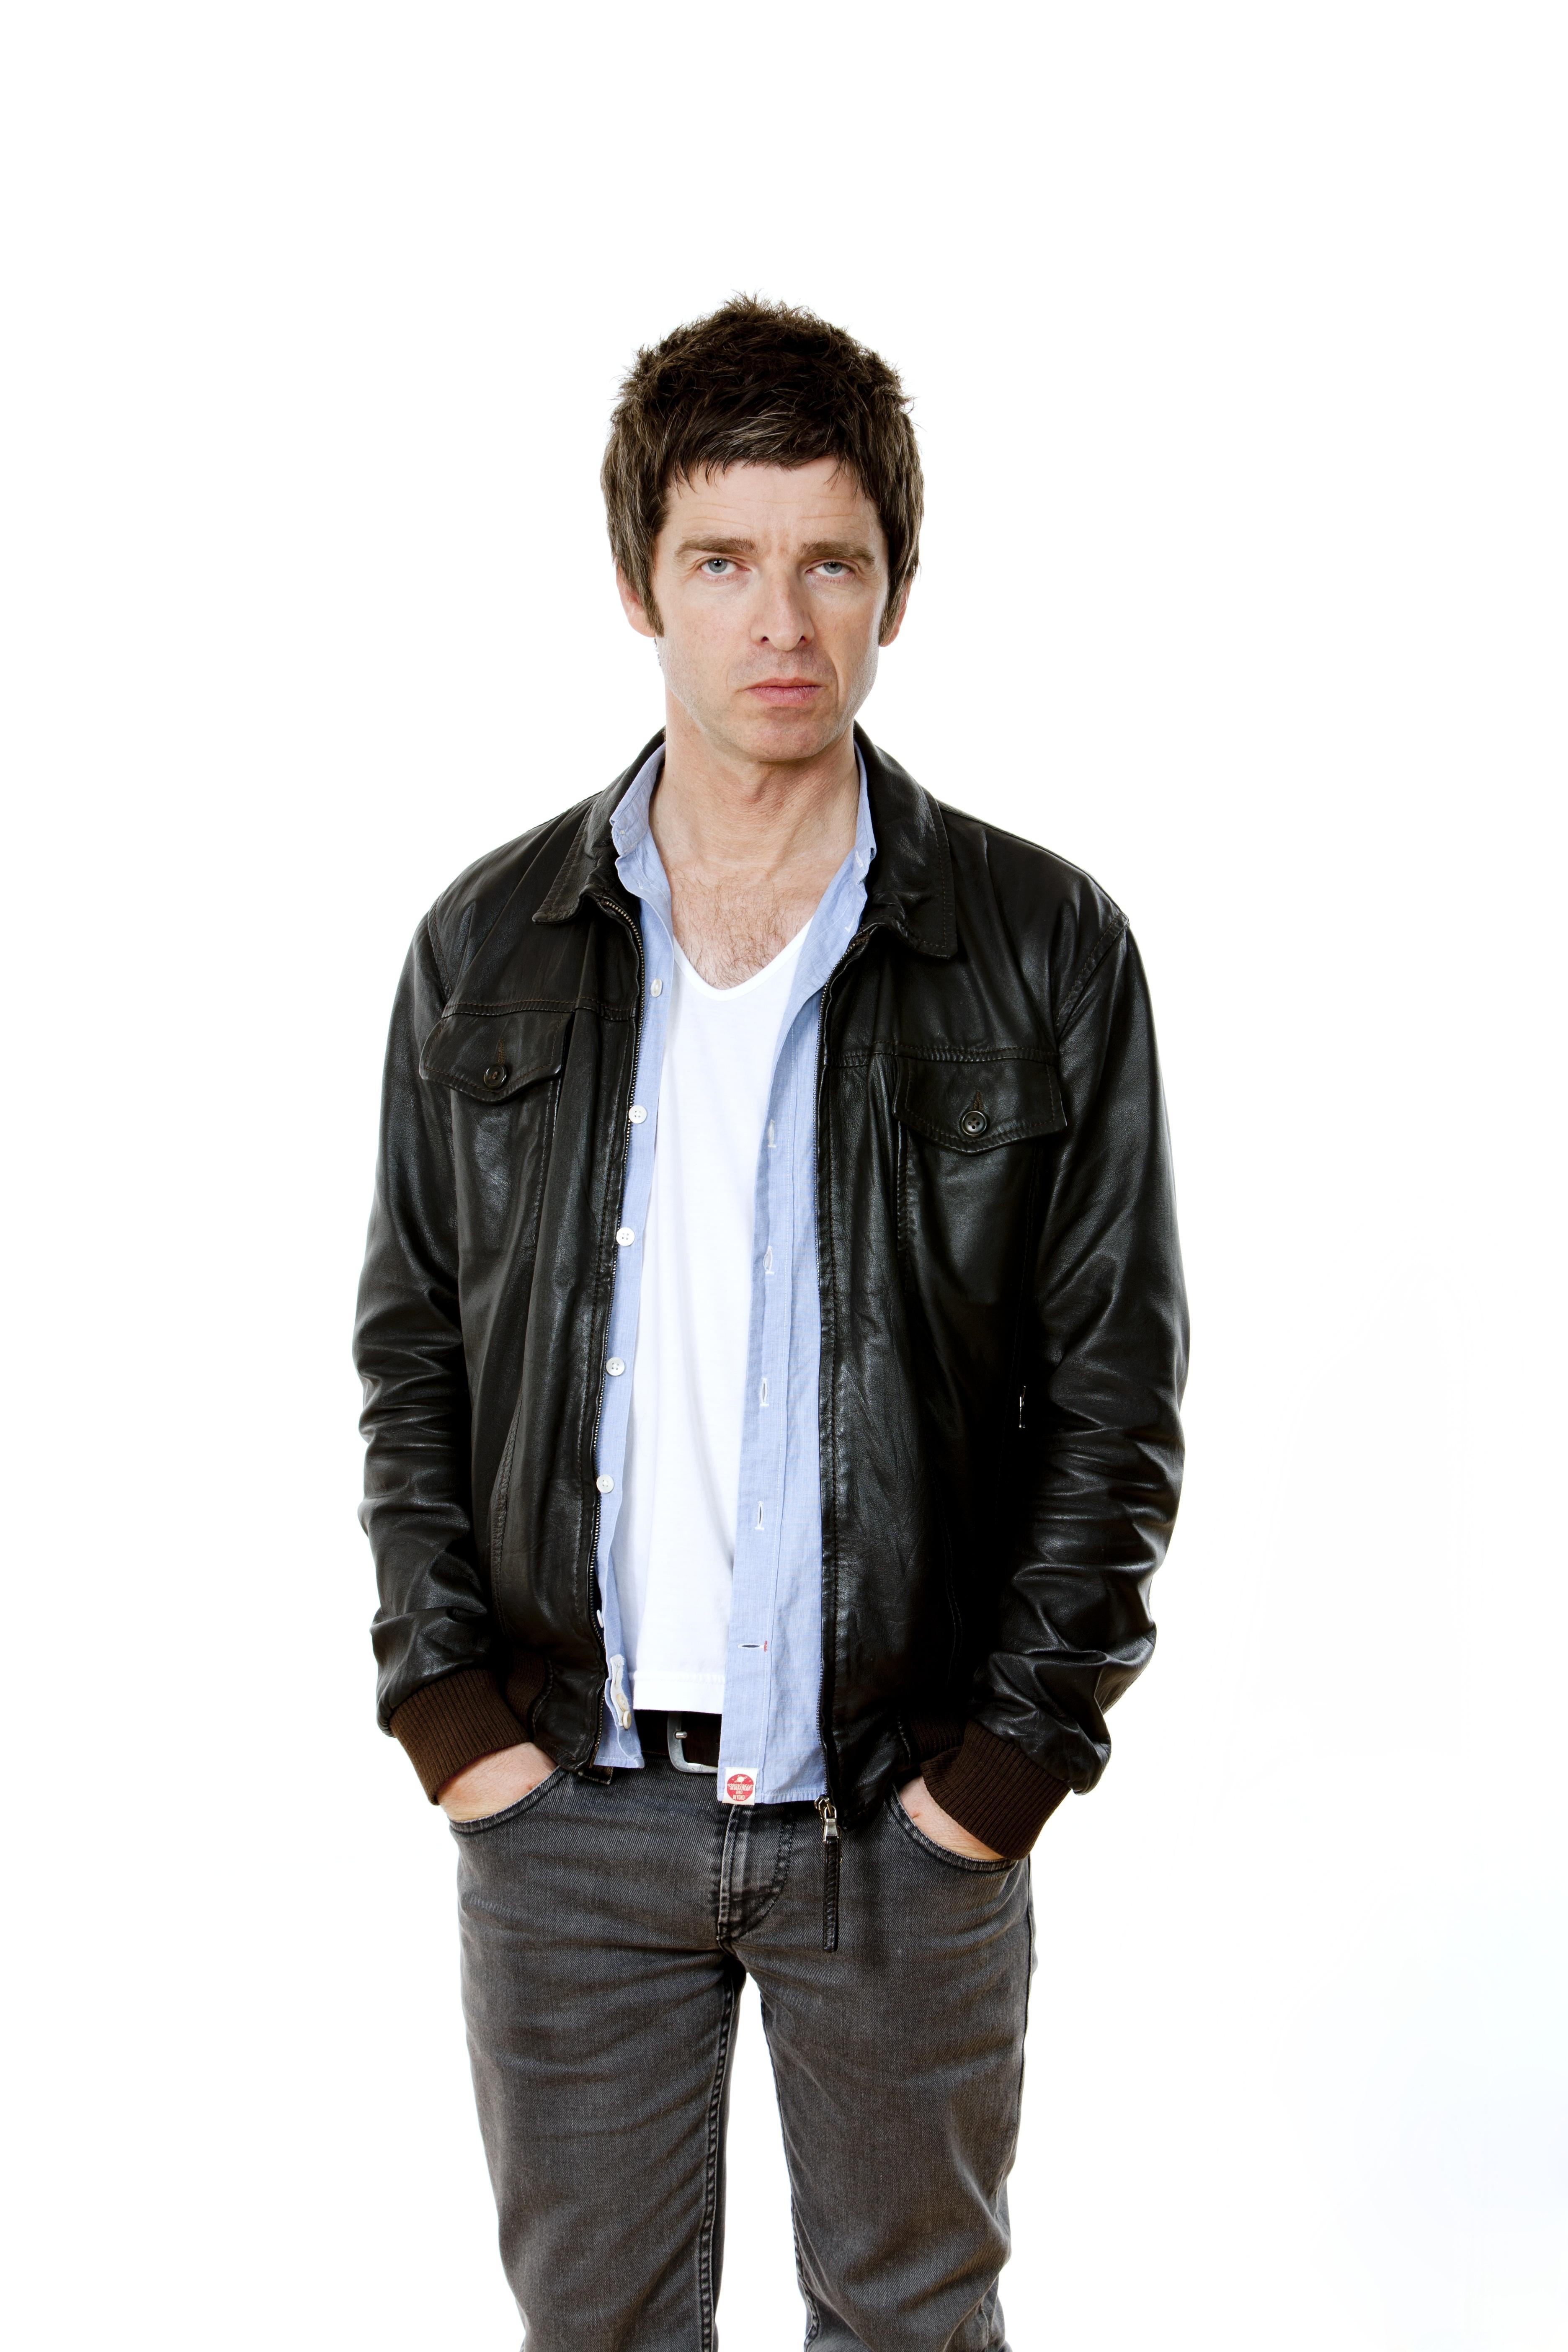 Noel Gallagher Desktop For Iphone